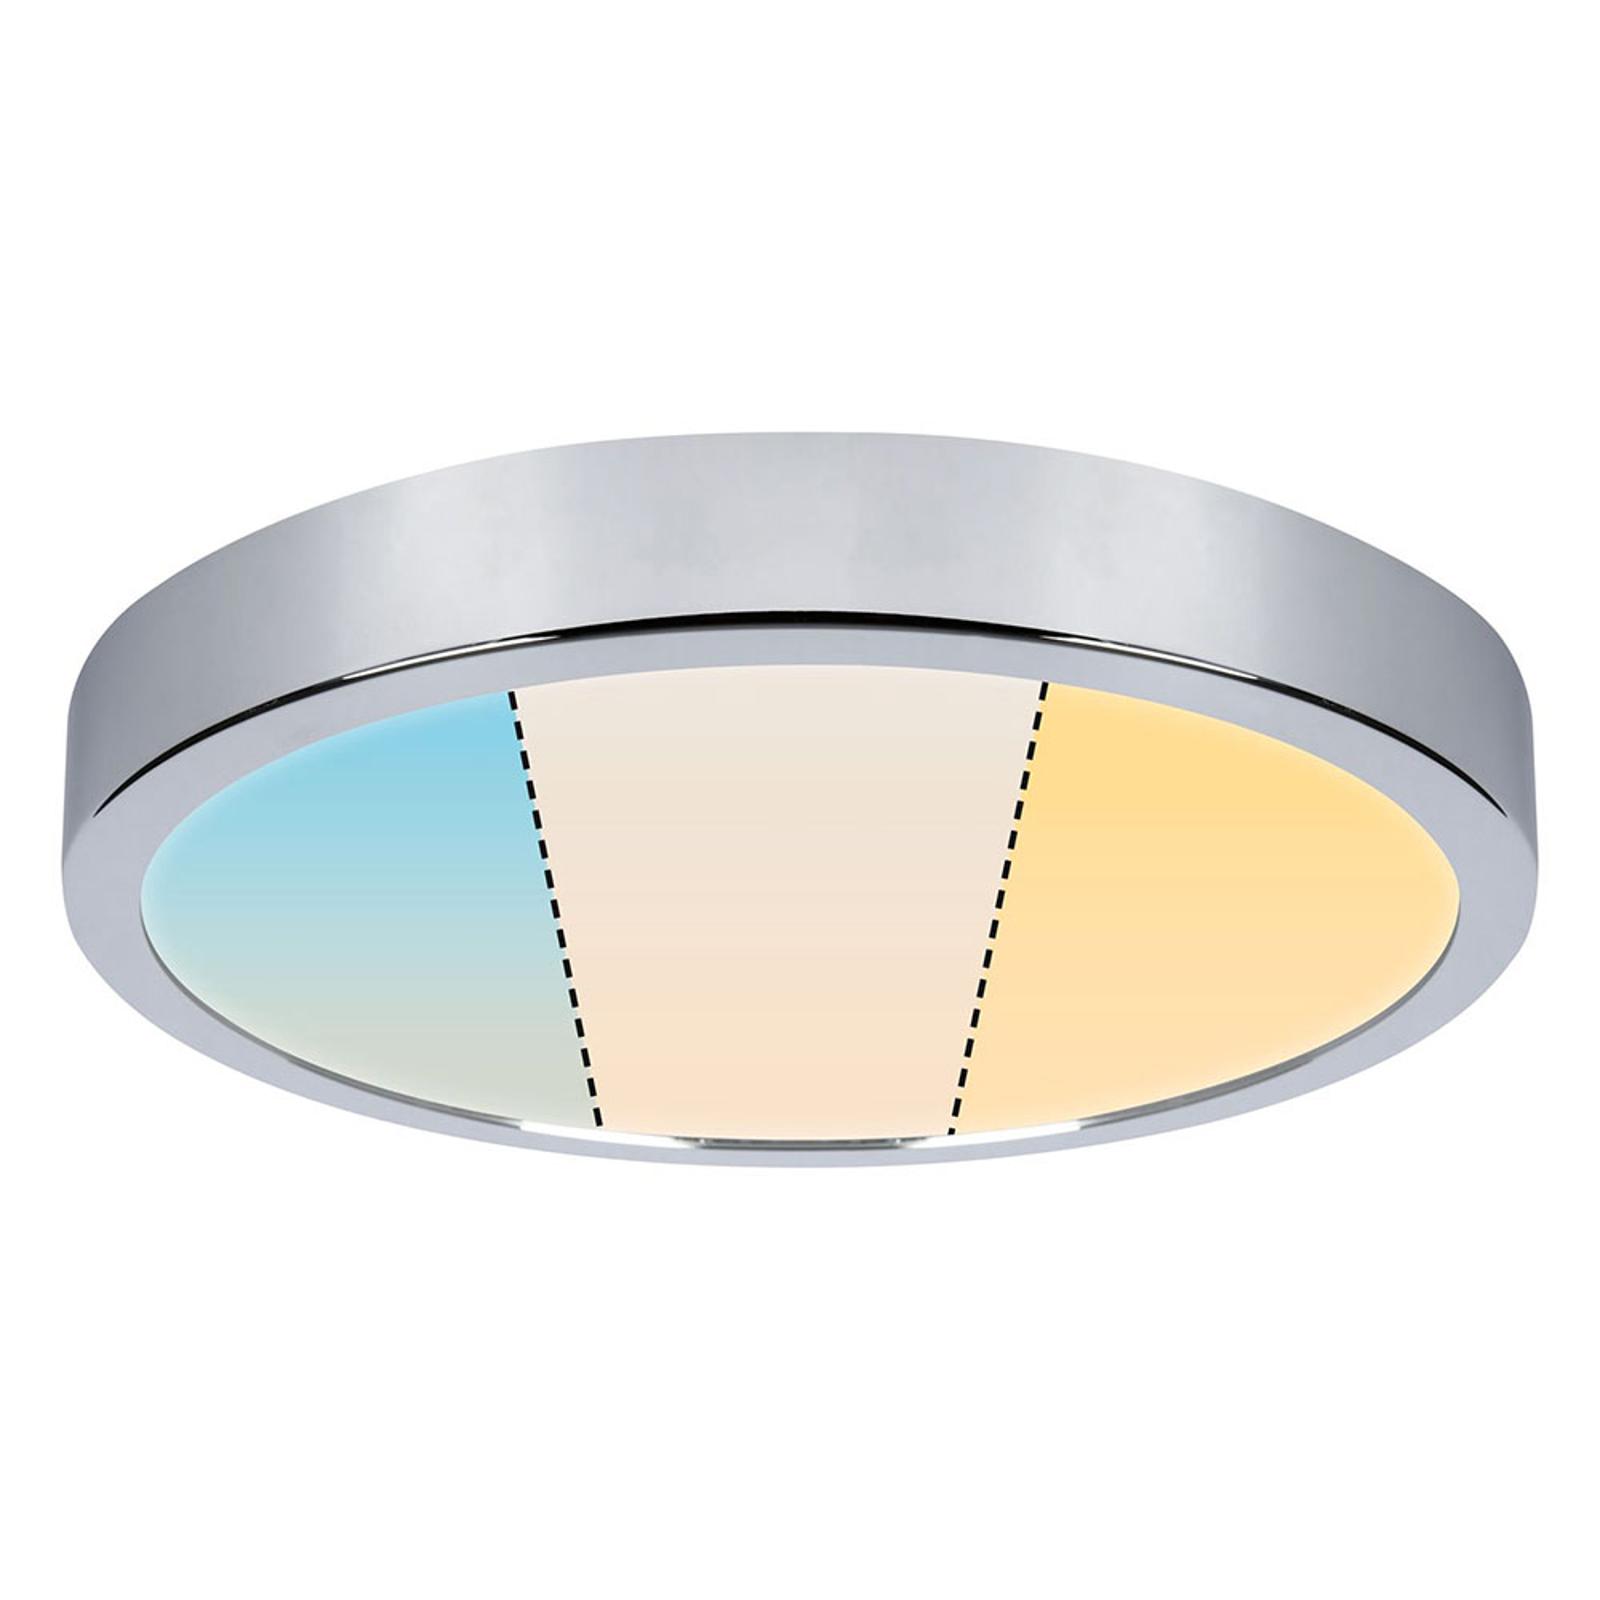 Dove acquistare Paulmann Aviar plafoniera LED WhiteSwitch Ø 30cm